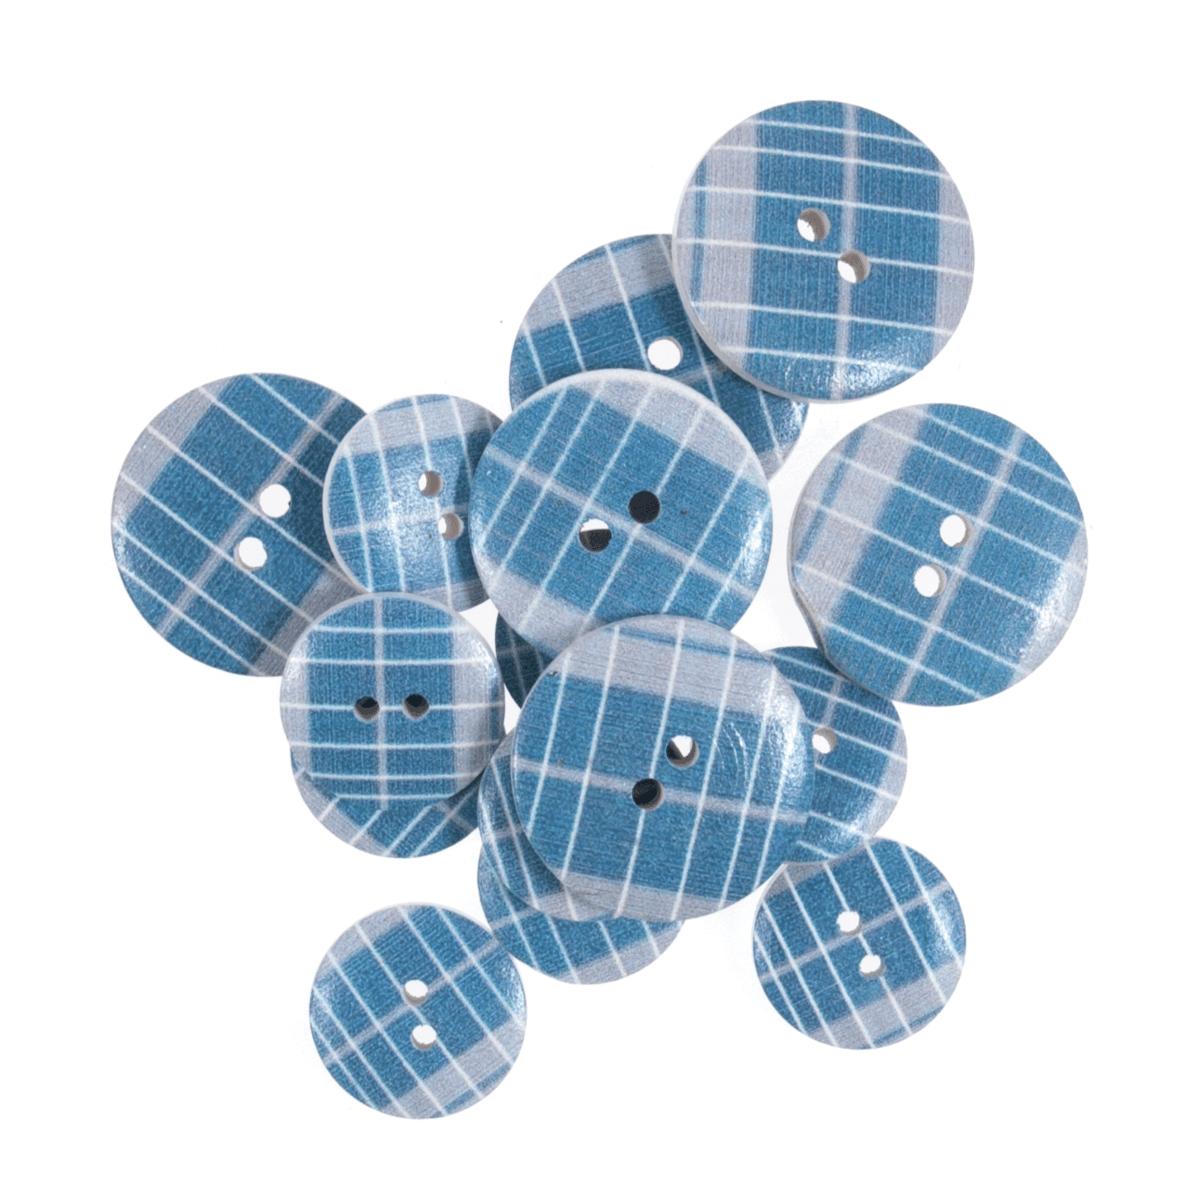 15 x Assorted Blue Line Stripe Wooden Craft Buttons 18mm - 25mm